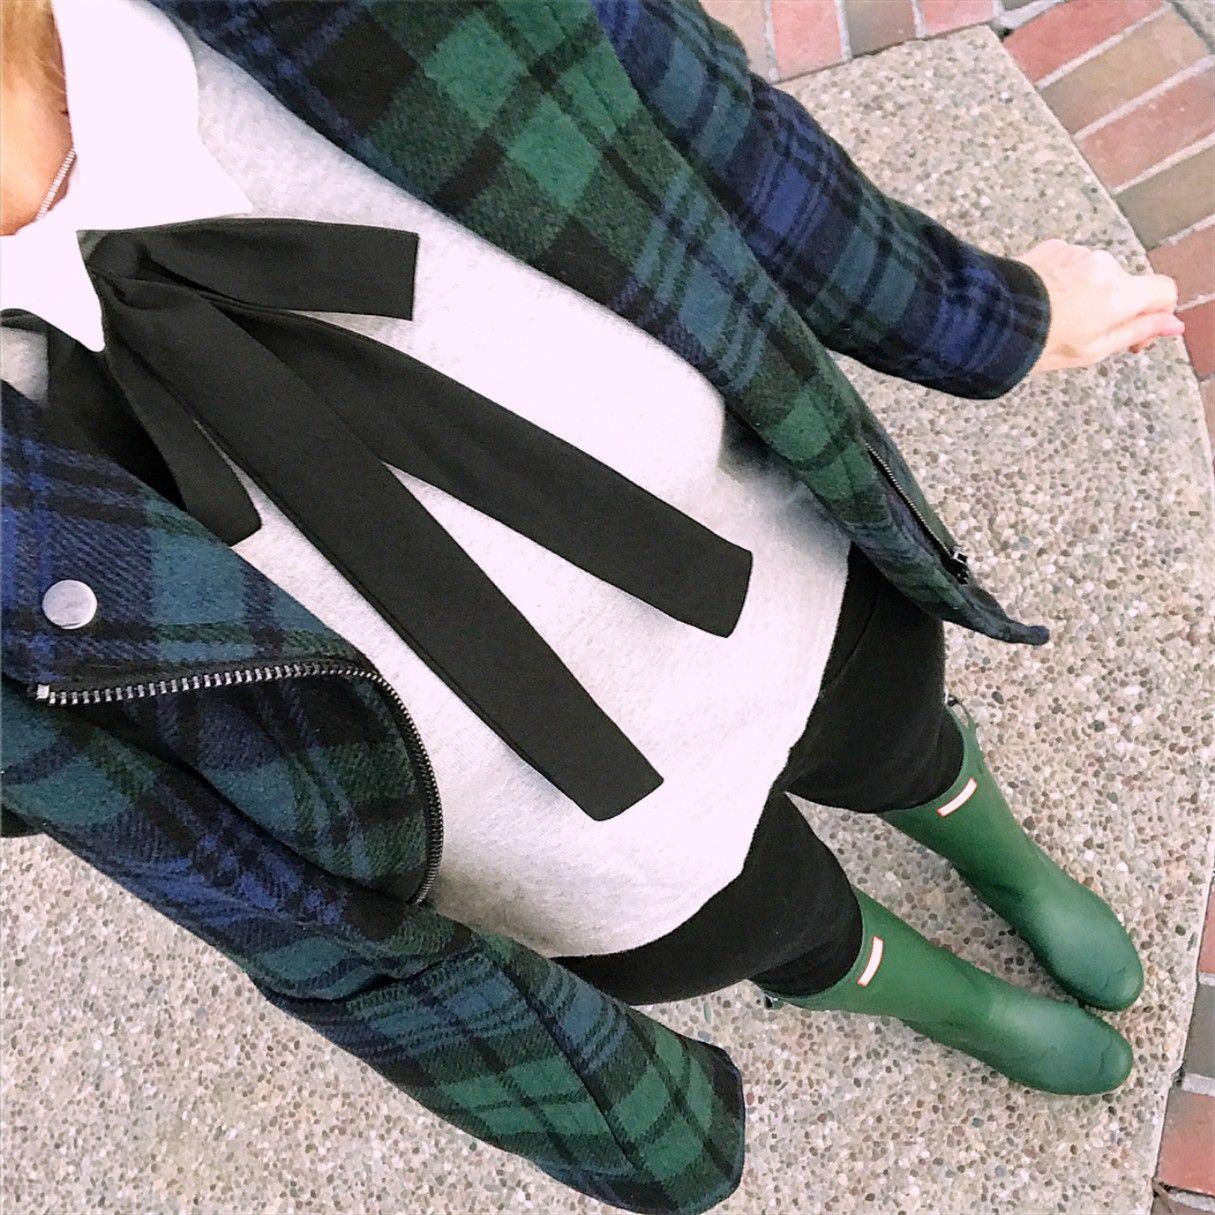 Photo of Abrigo a cuadros verde y azul marino Hunter, botas de lluvia Hunter verdes, suéter con lazo; fiesta …